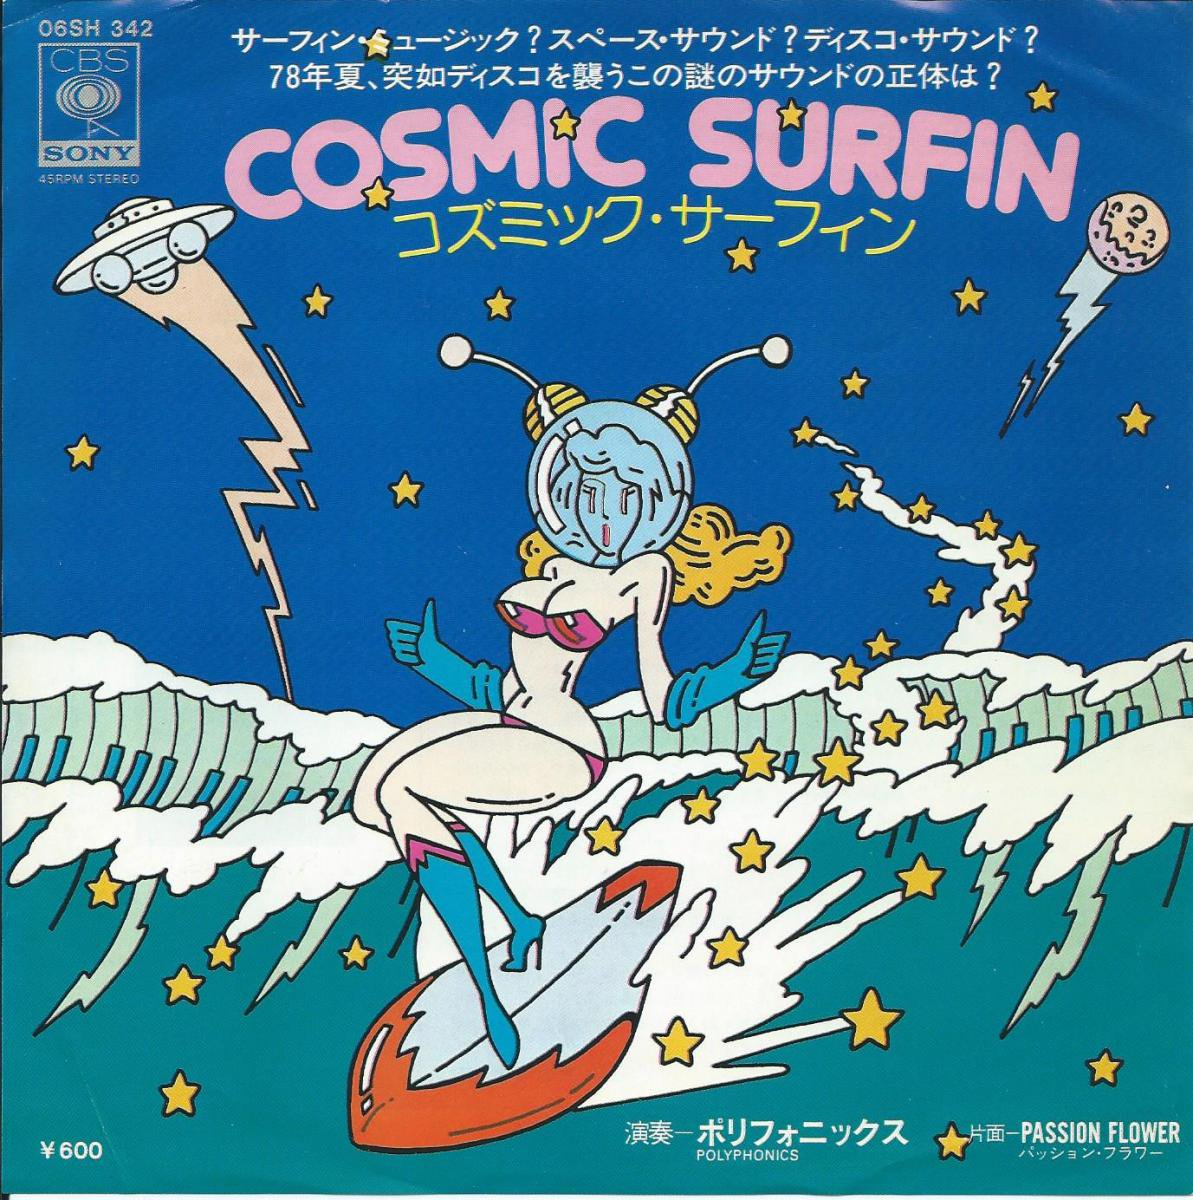 Polyphonics Cosmic Surfin Passion Flower